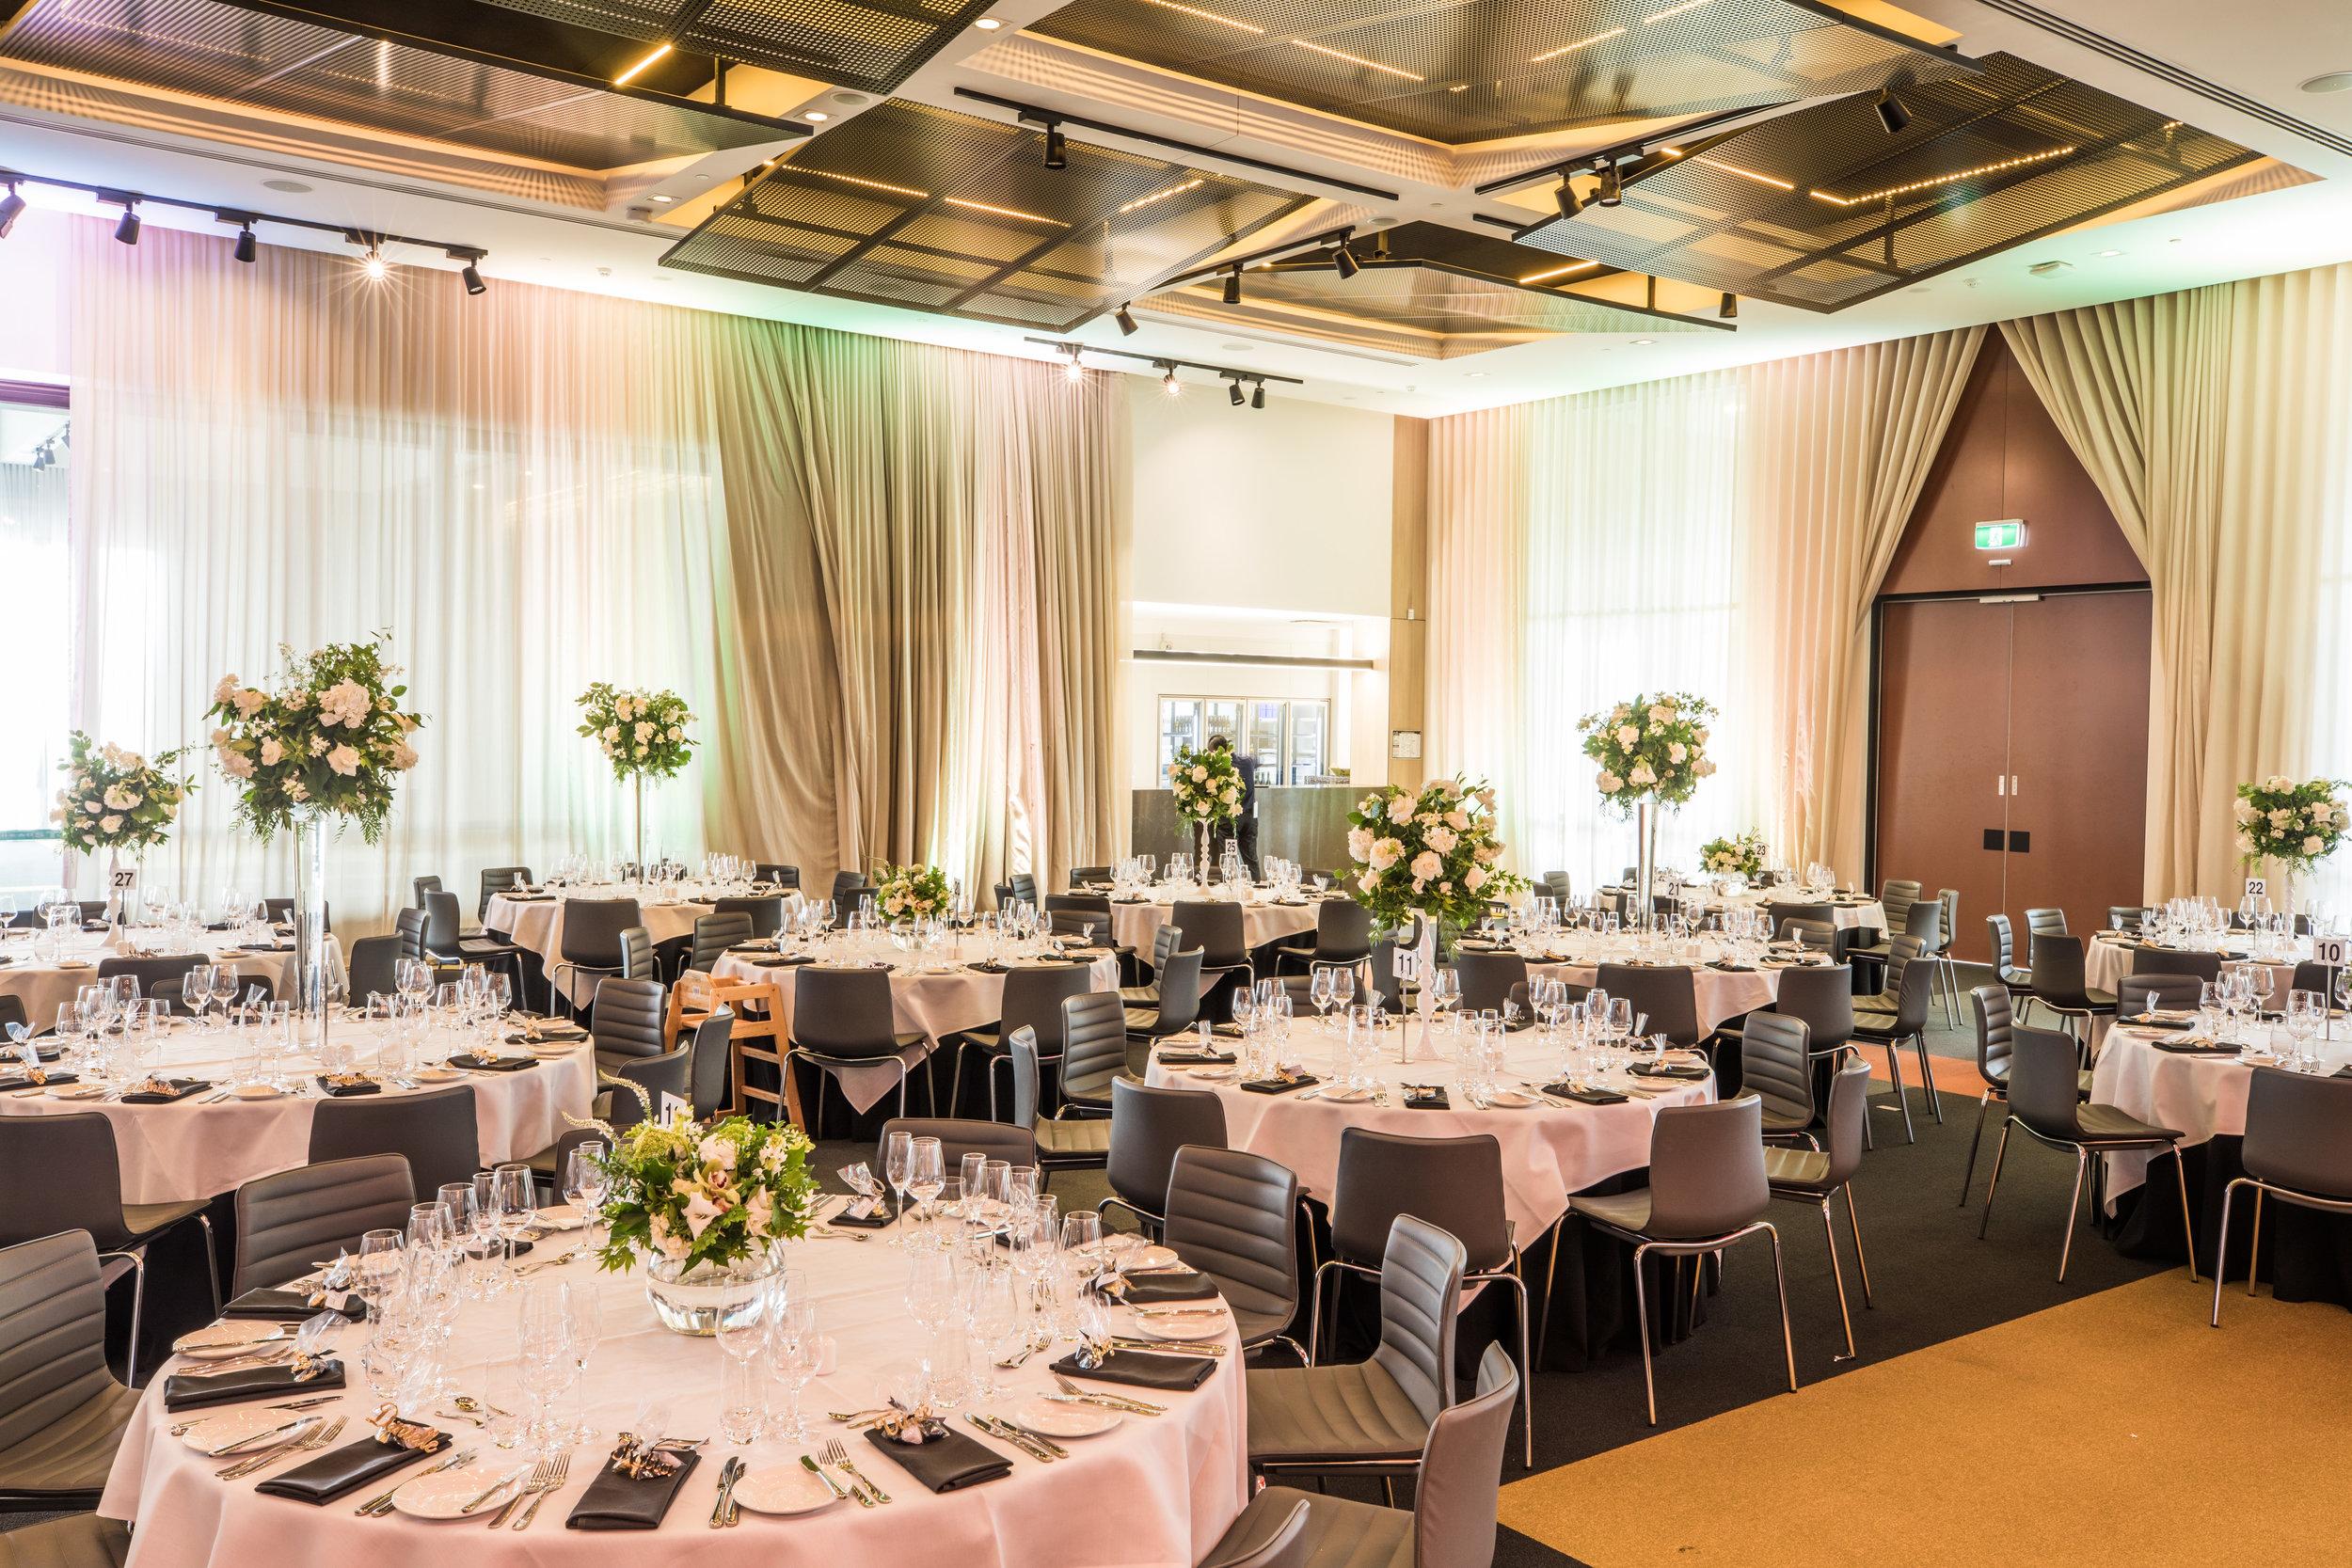 The Australian Rooms at Hyatt Place Melbourne wedding venue